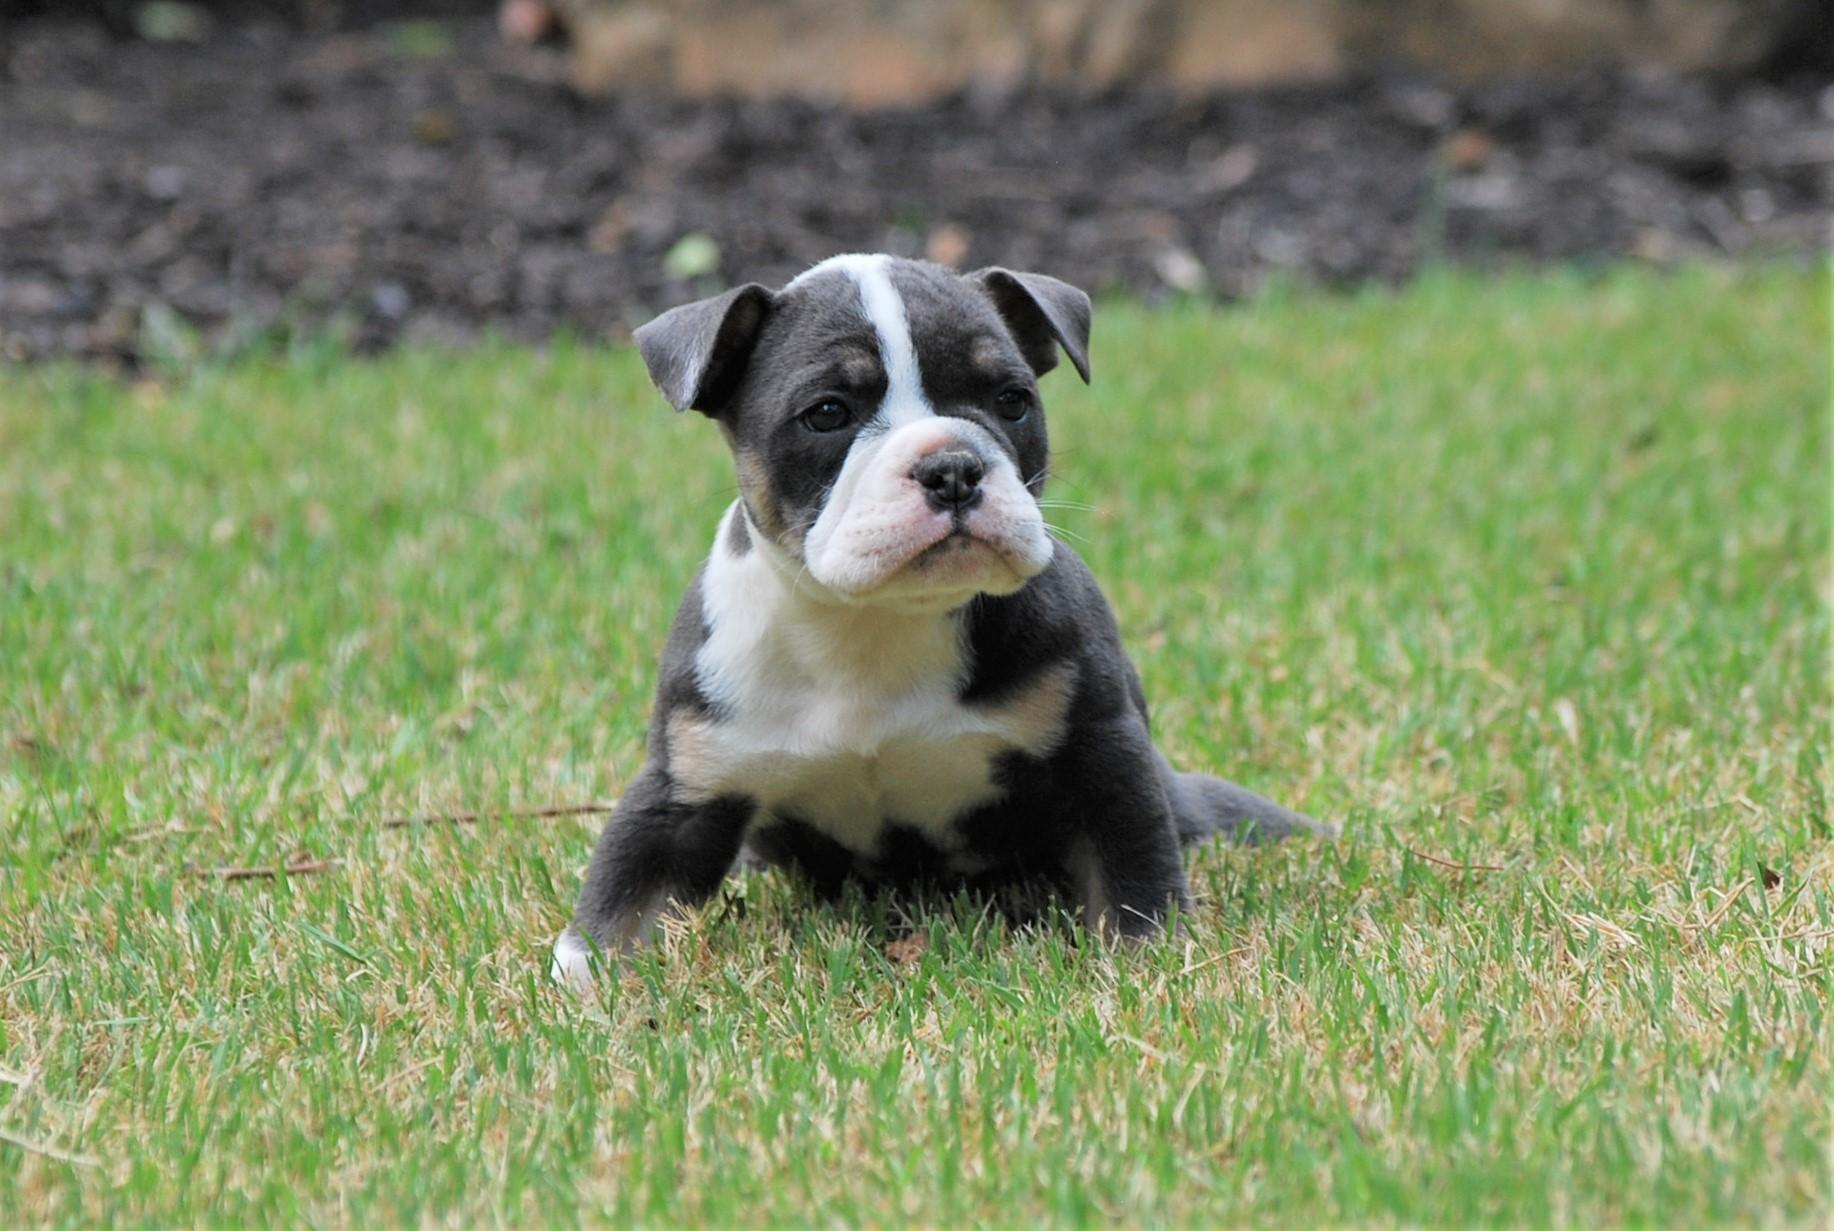 Vinny Olde English Bulldogge Puppy For Sale | Photo 3